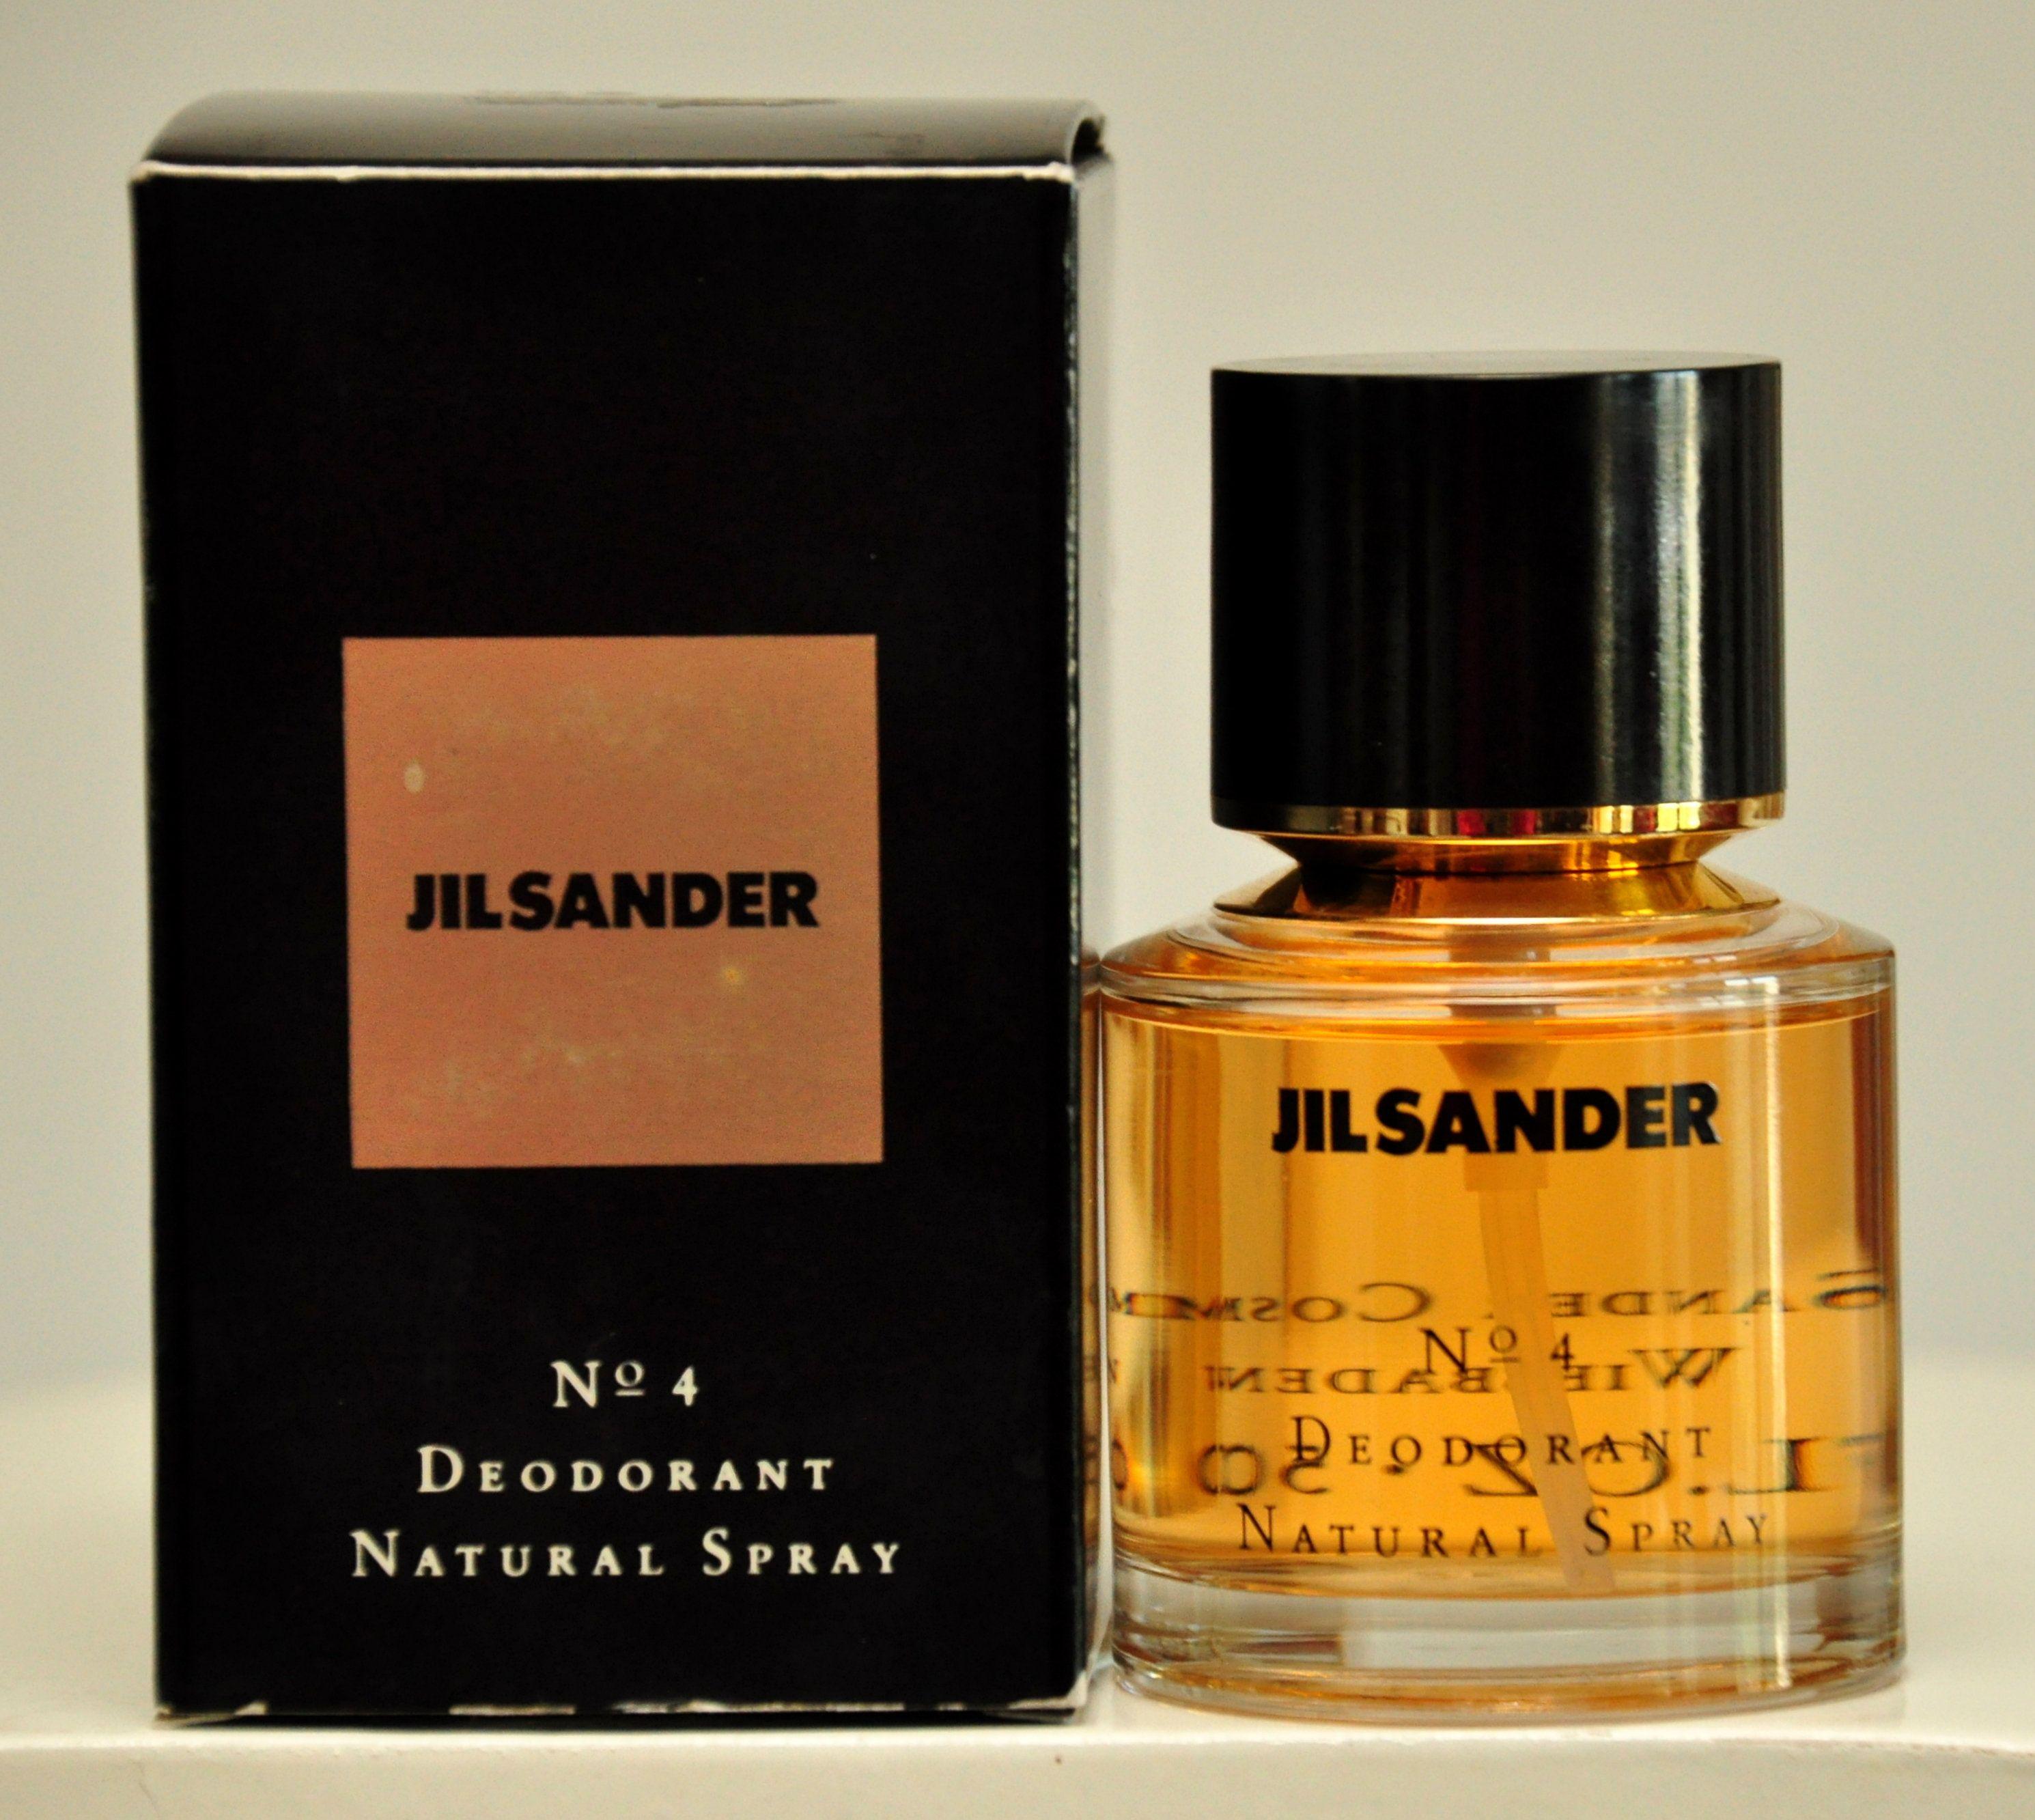 Jil Sander No 4 Deodorant Natural Spray 50ml 1 7 Fl Oz Perfume Deodorant Woman Super Rare Vintage 1990 Natural Deodorant Deodorant Perfume